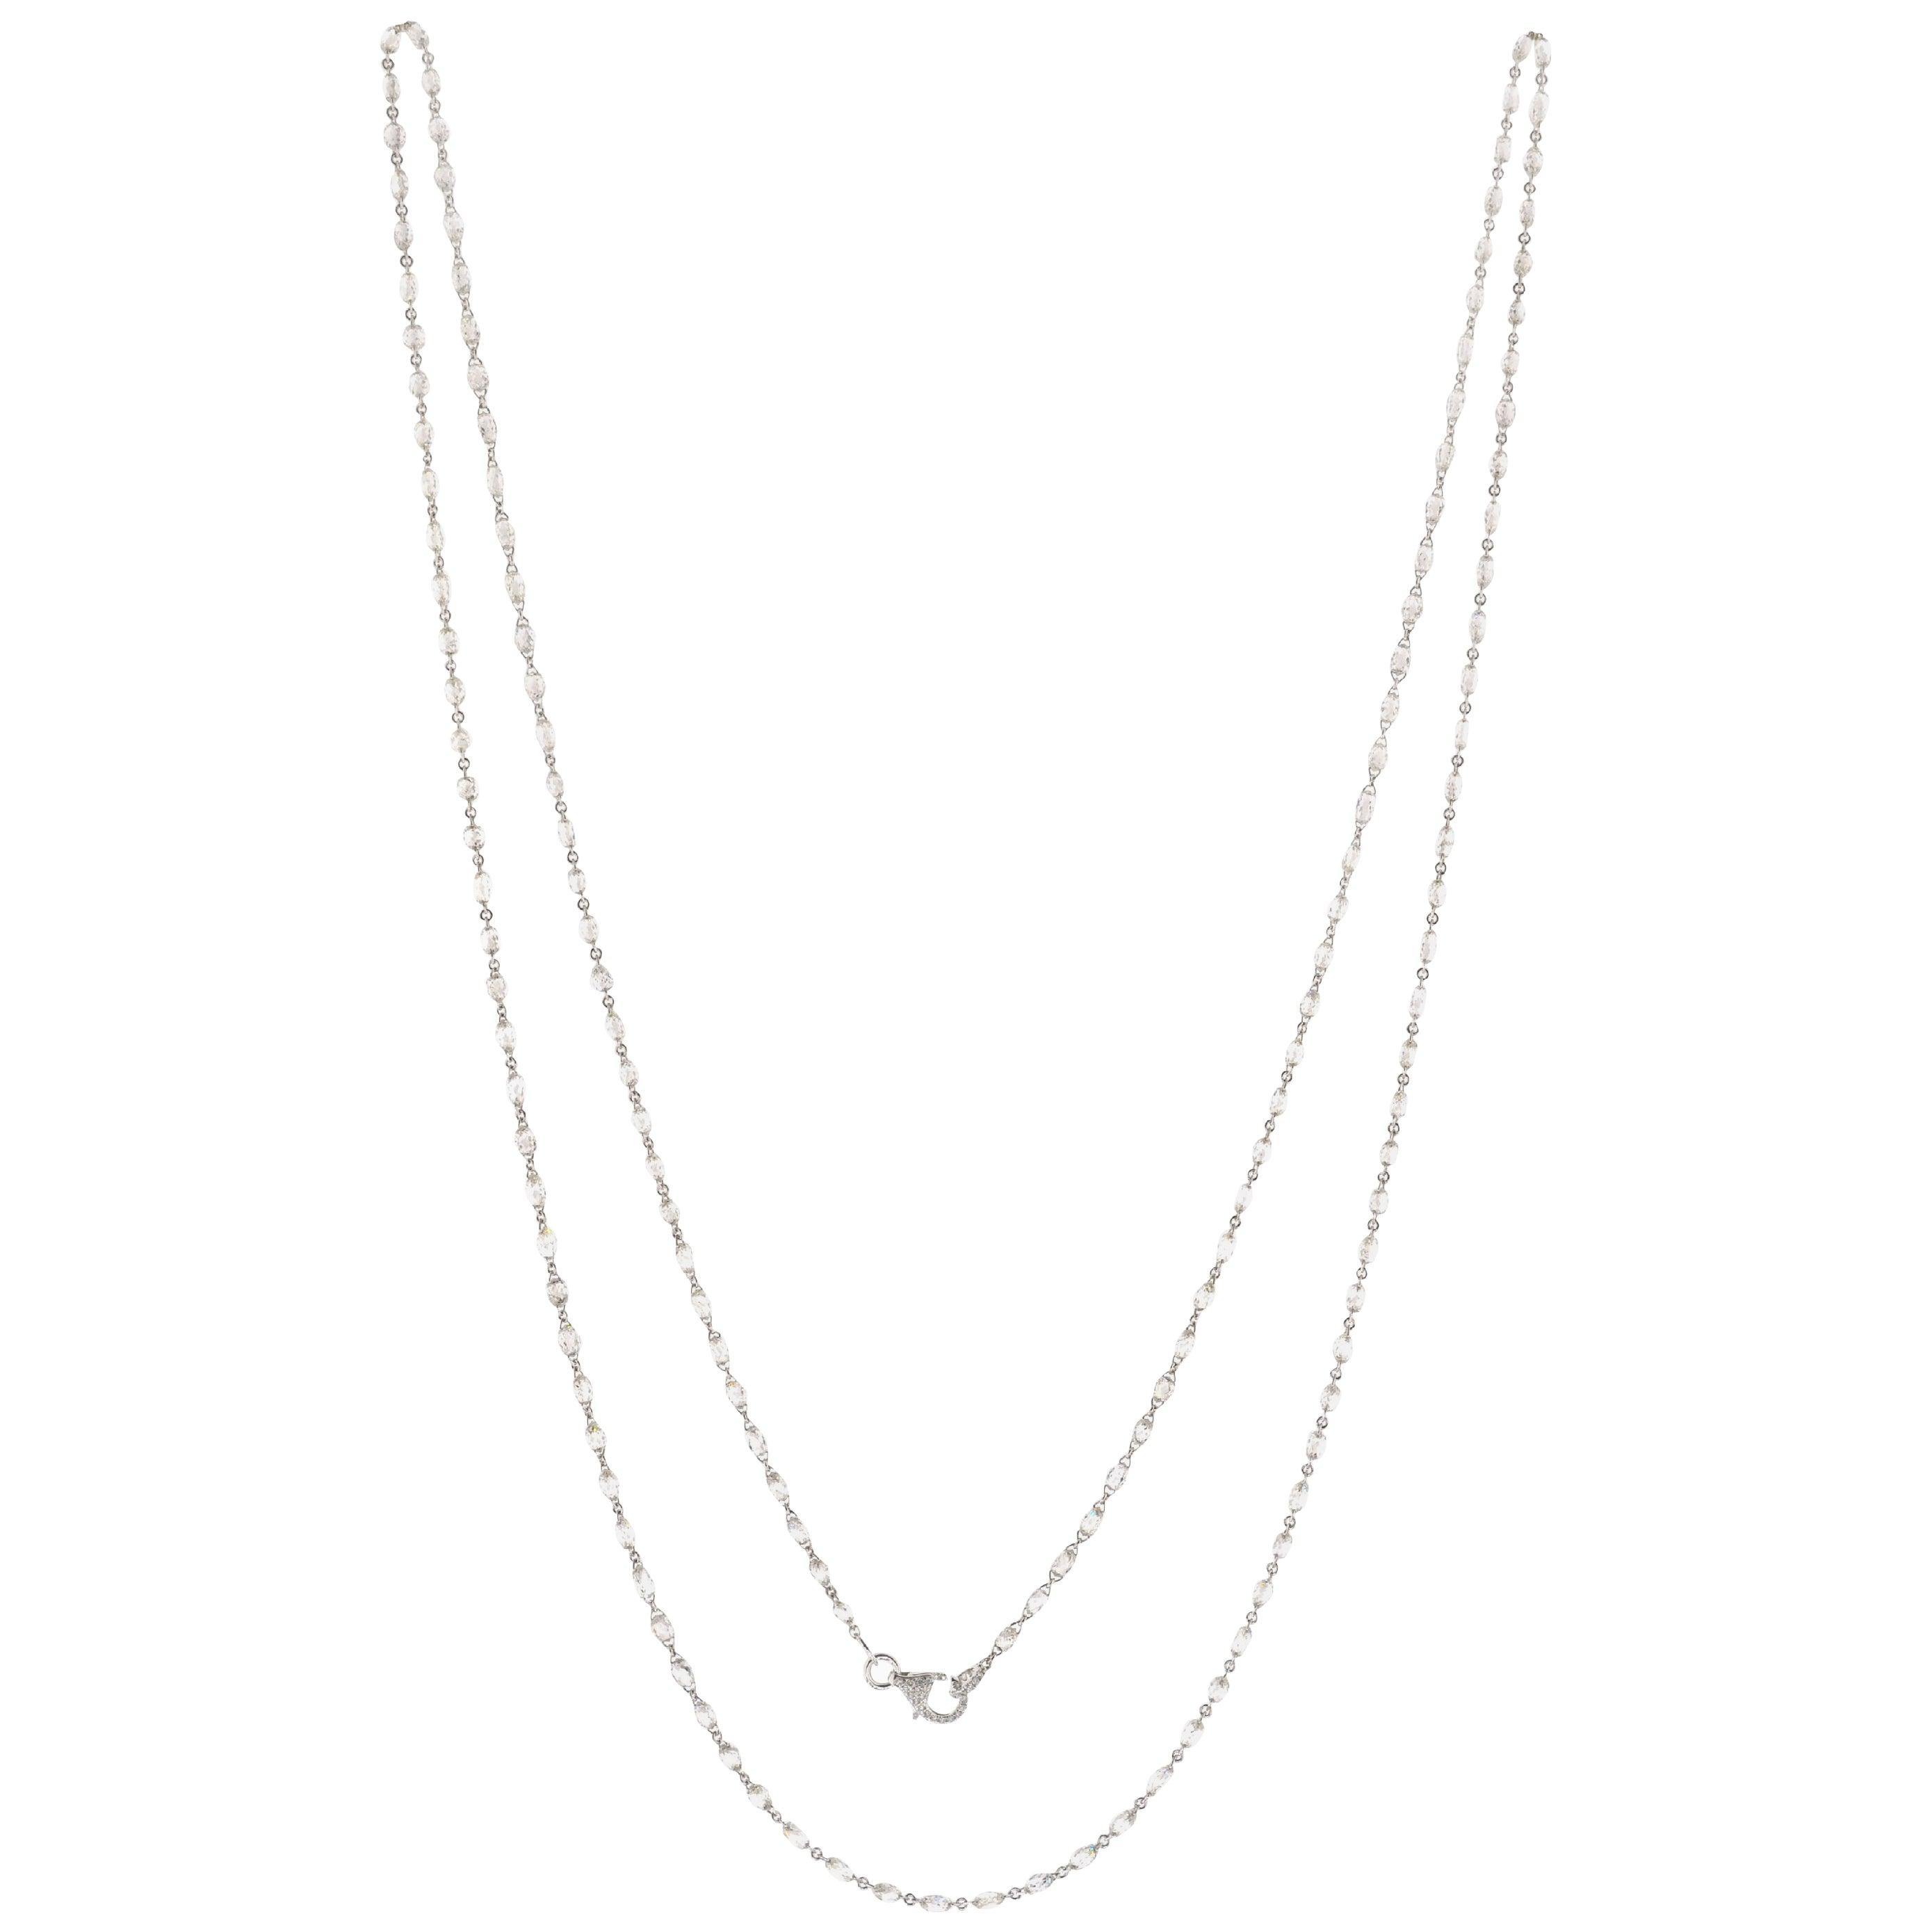 JR 27.51 Carat White Diamond Briolette Necklace 18 Karat White Gold